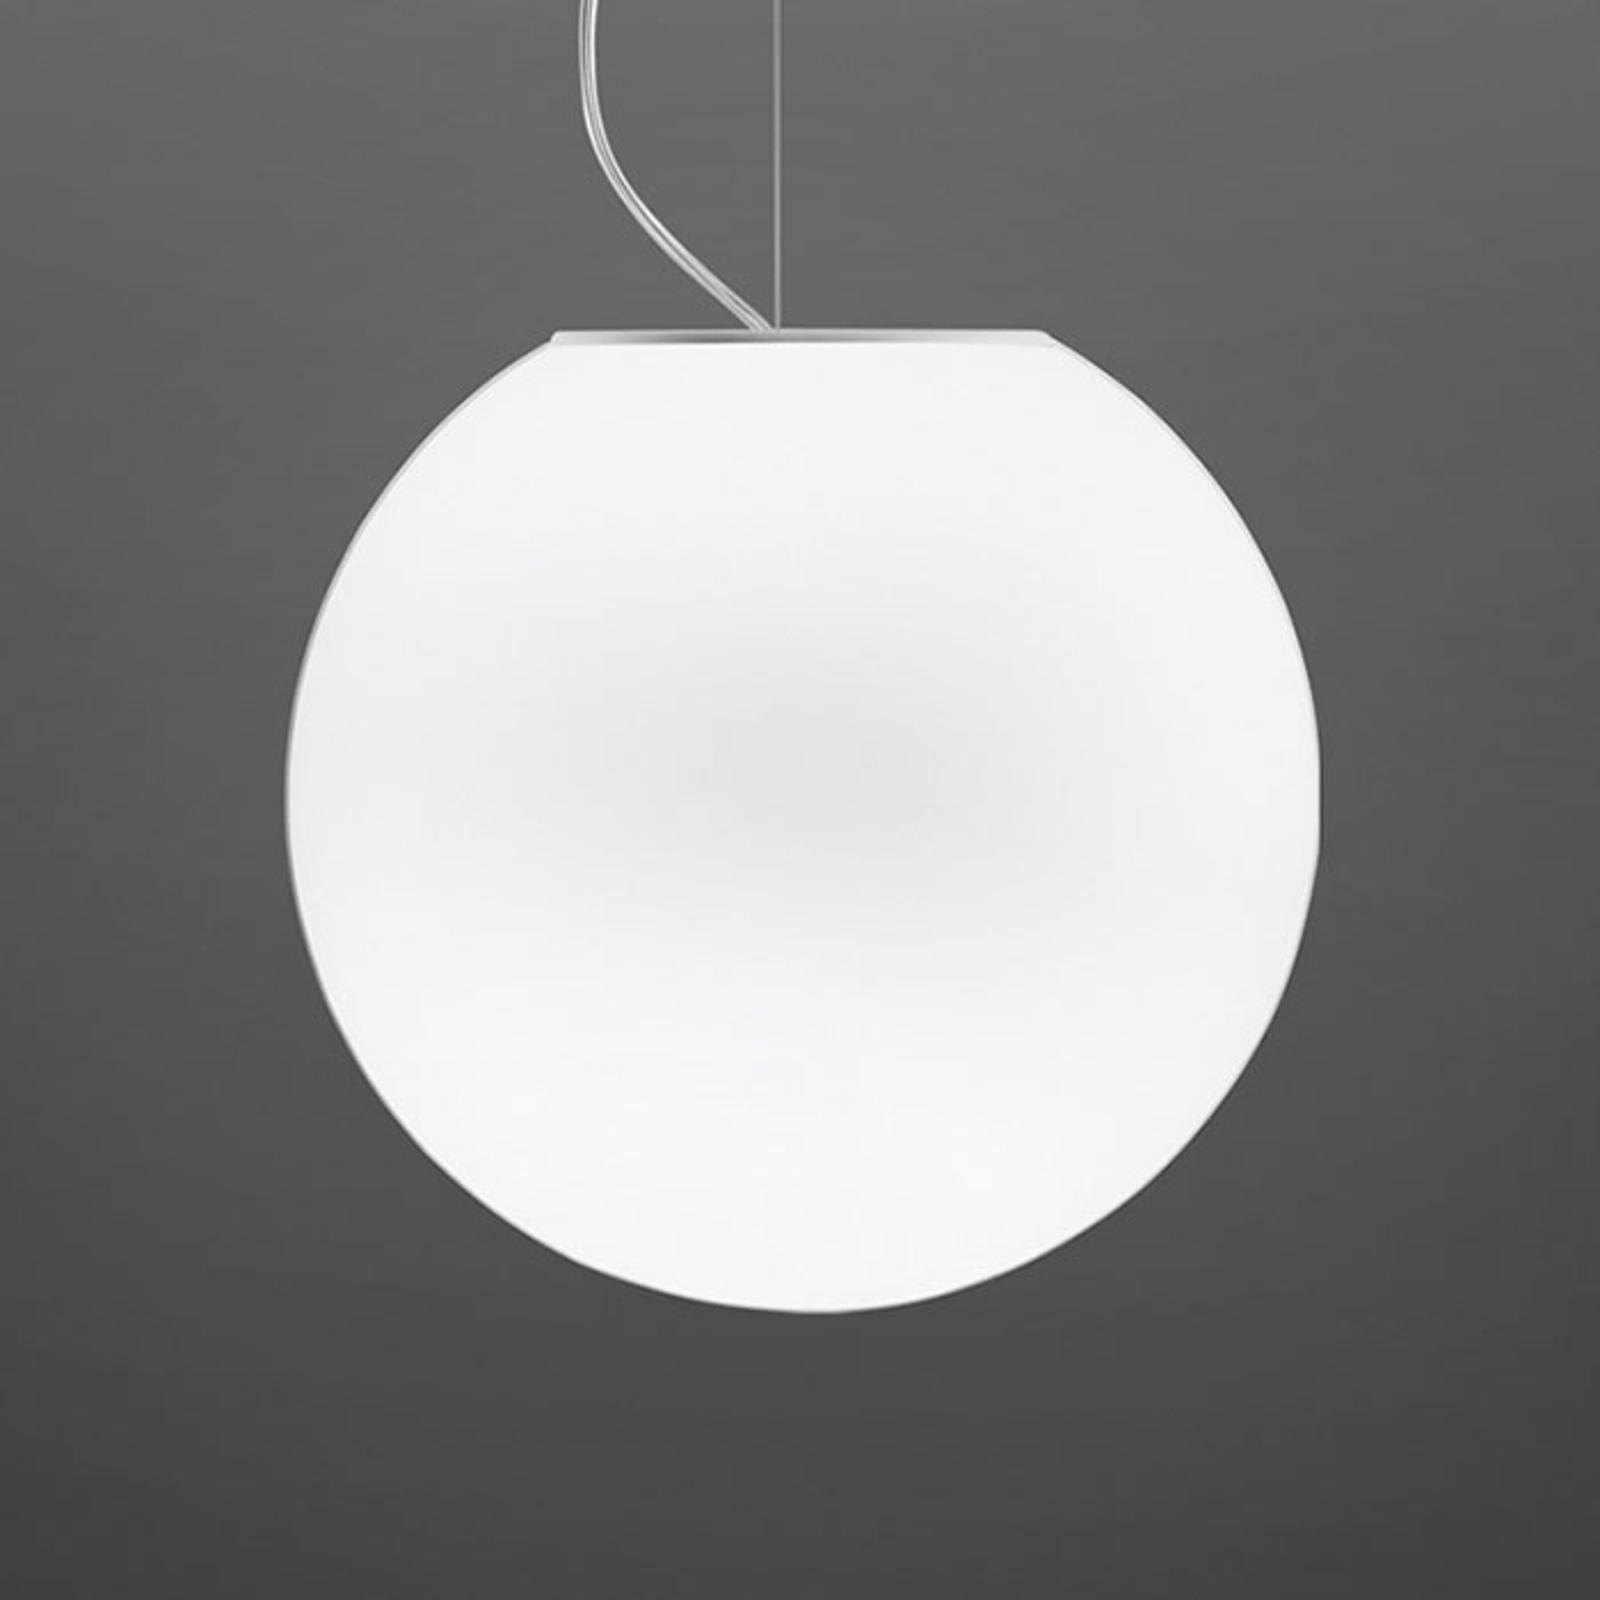 Fabbian Lumi Sfera Glas-Hängeleuchte, Ø 35 cm